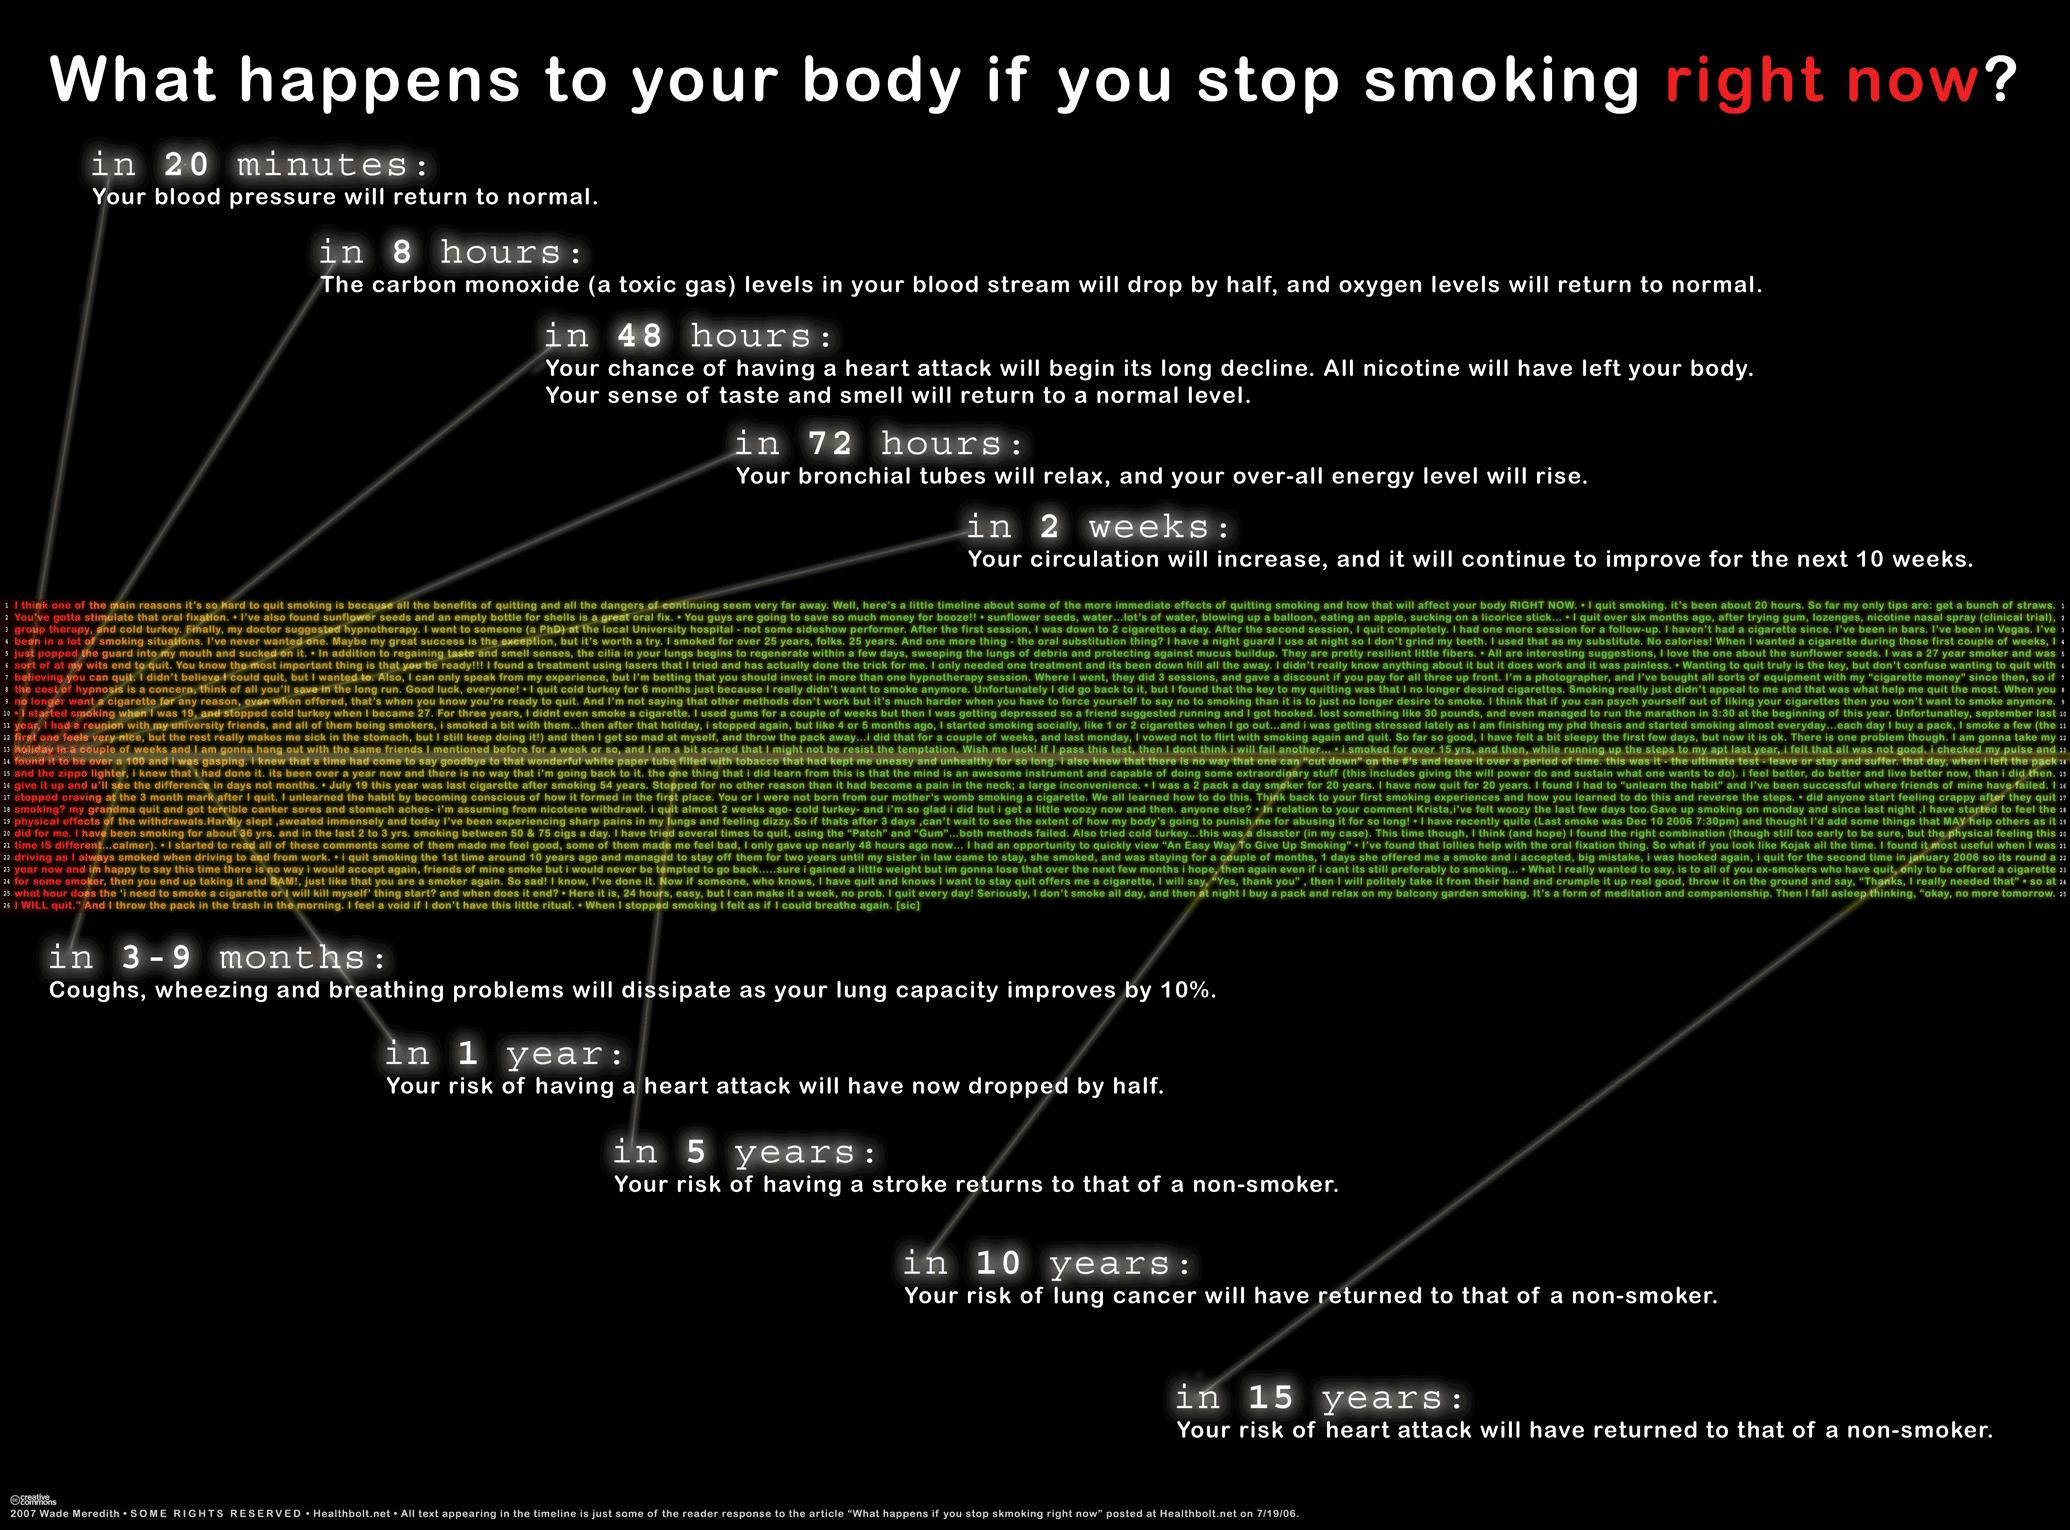 north-cyprus-smoking-timeline